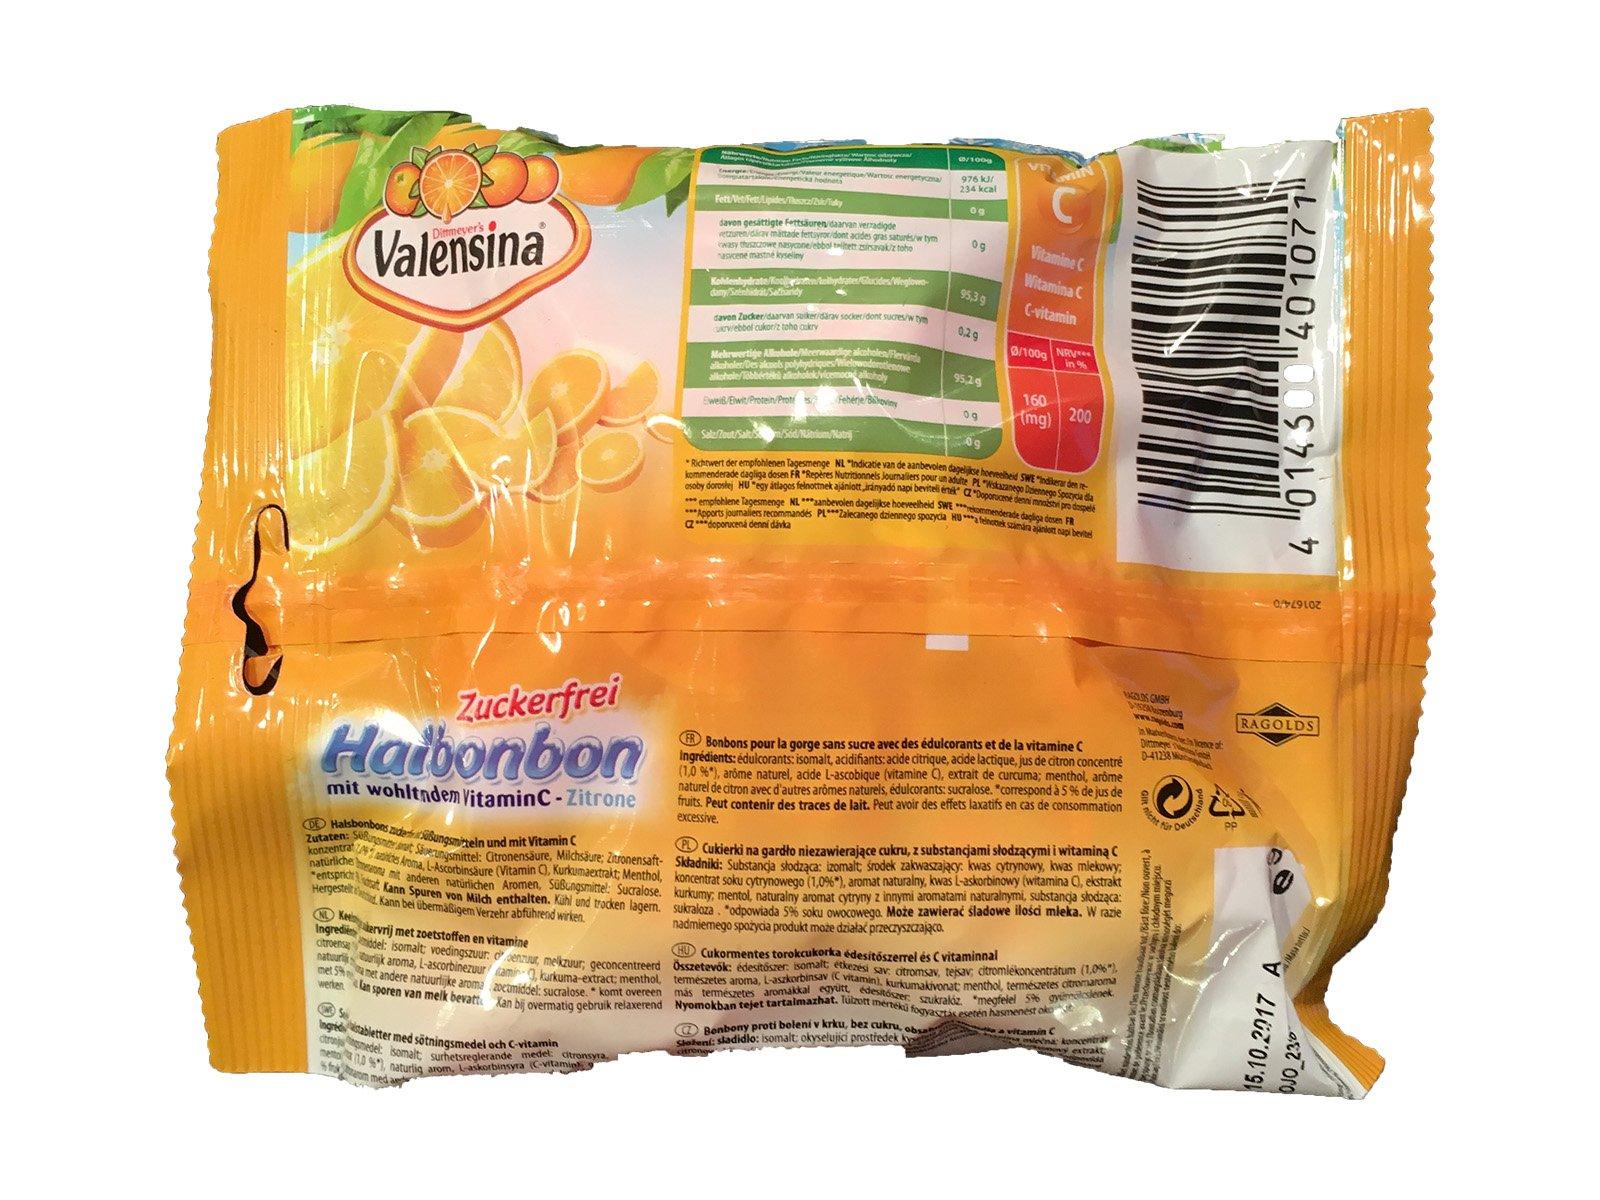 Valensina Halsbonbon Zuckerfrei